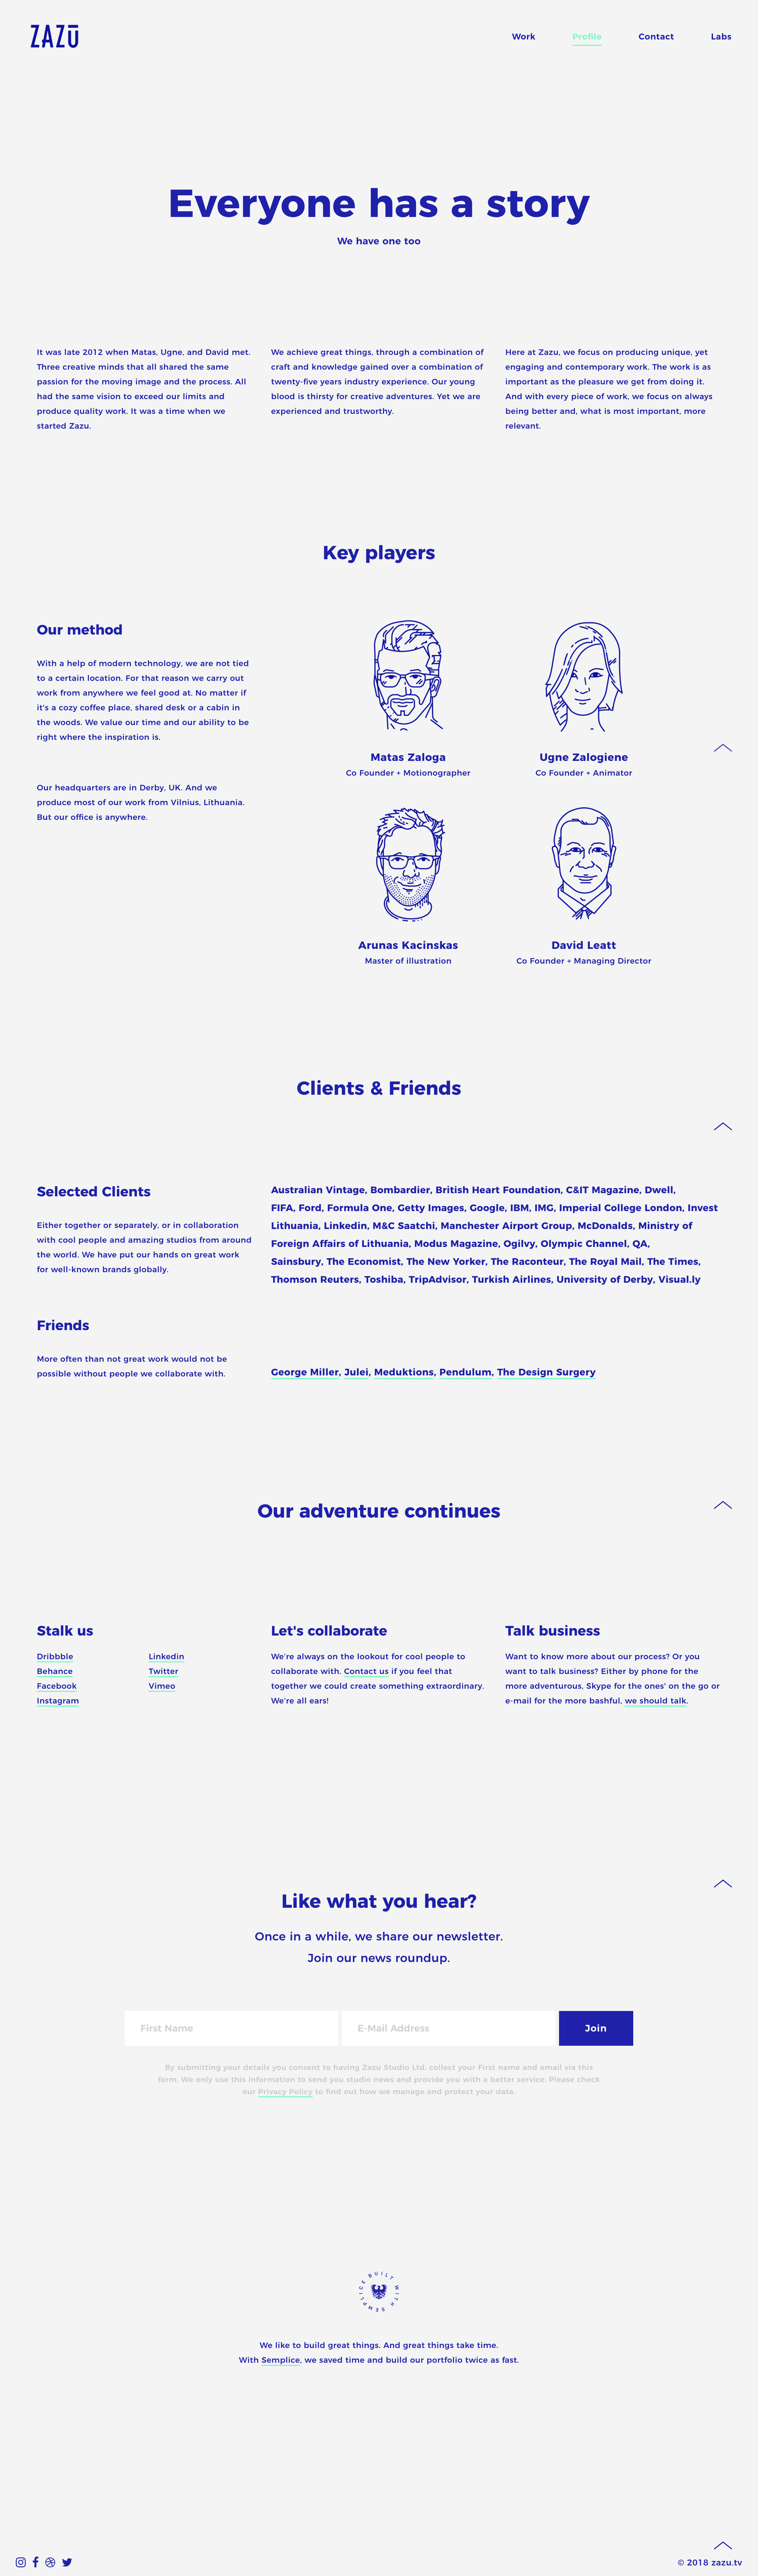 Pin by Choo Lin on web design | Motion design, Design, Web